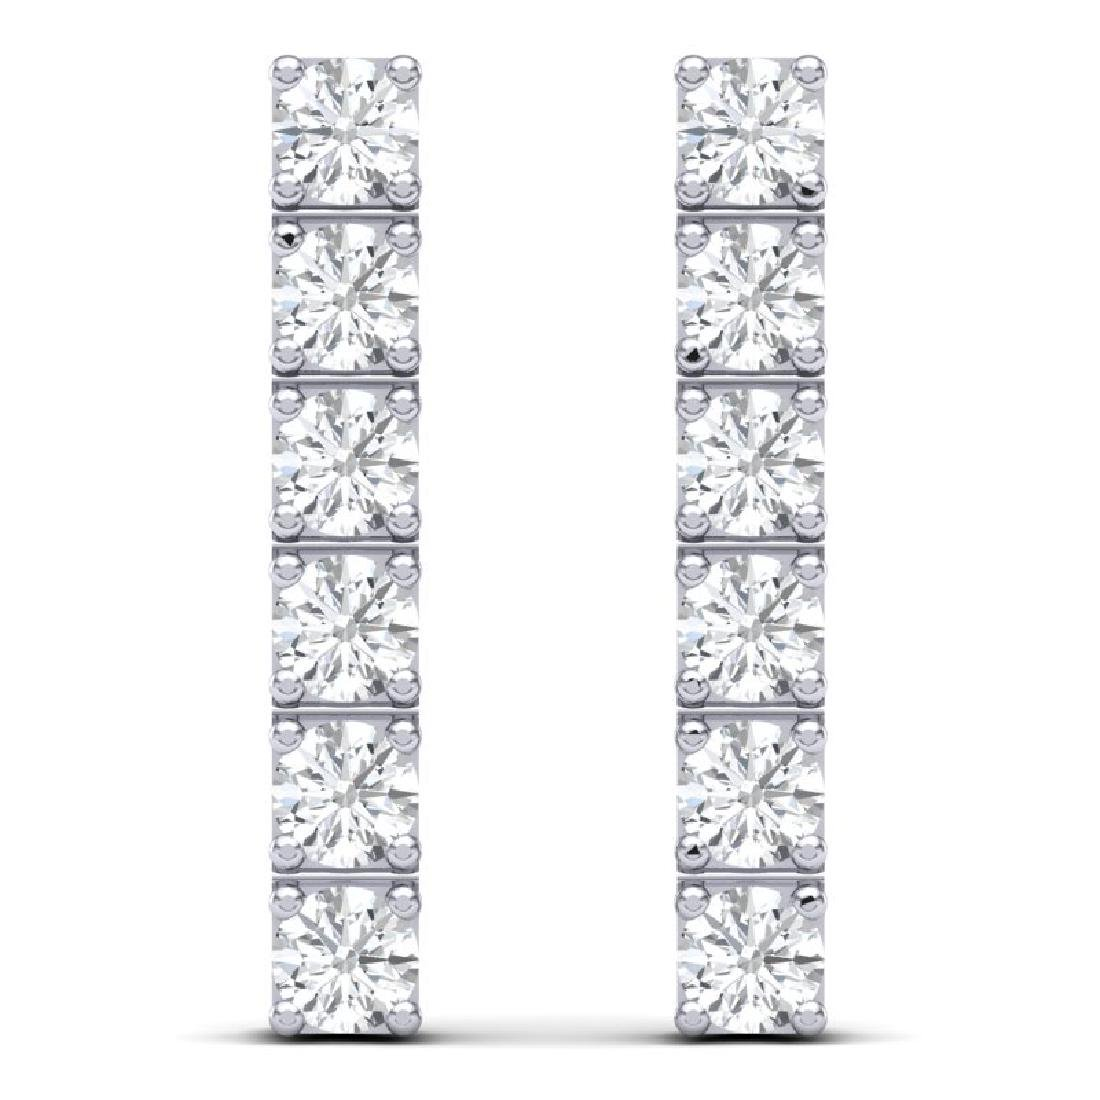 6 CTW Certified SI Diamond Earrings 18K White Gold - 3